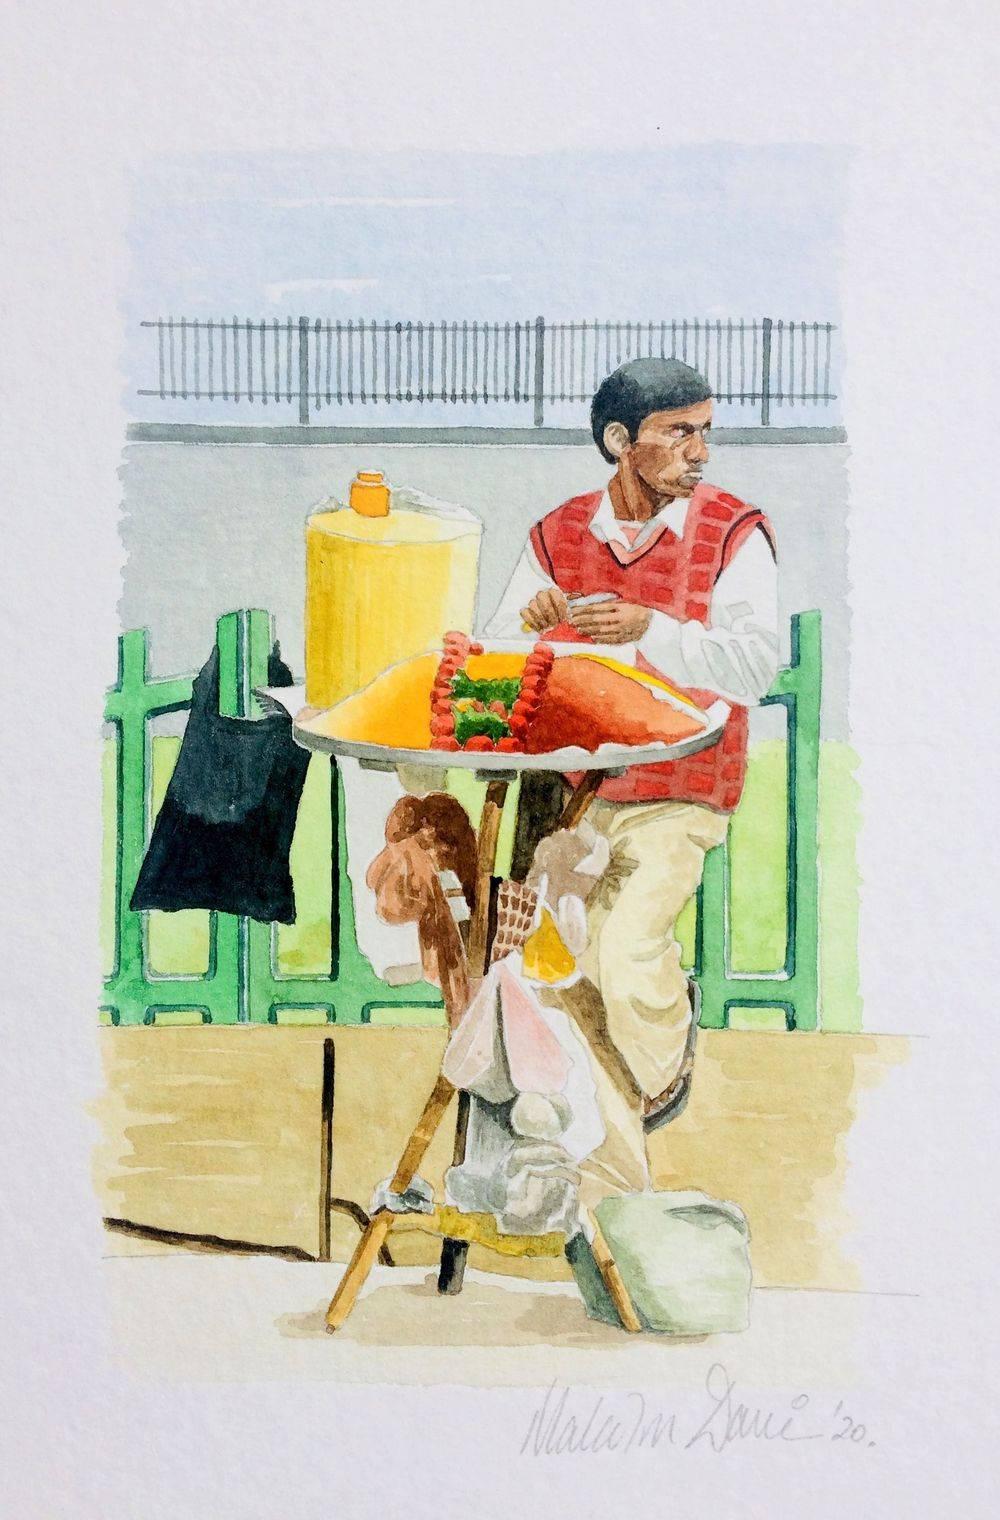 Delhi - India - Streetside Food Seller (Watercolour) : SOLD